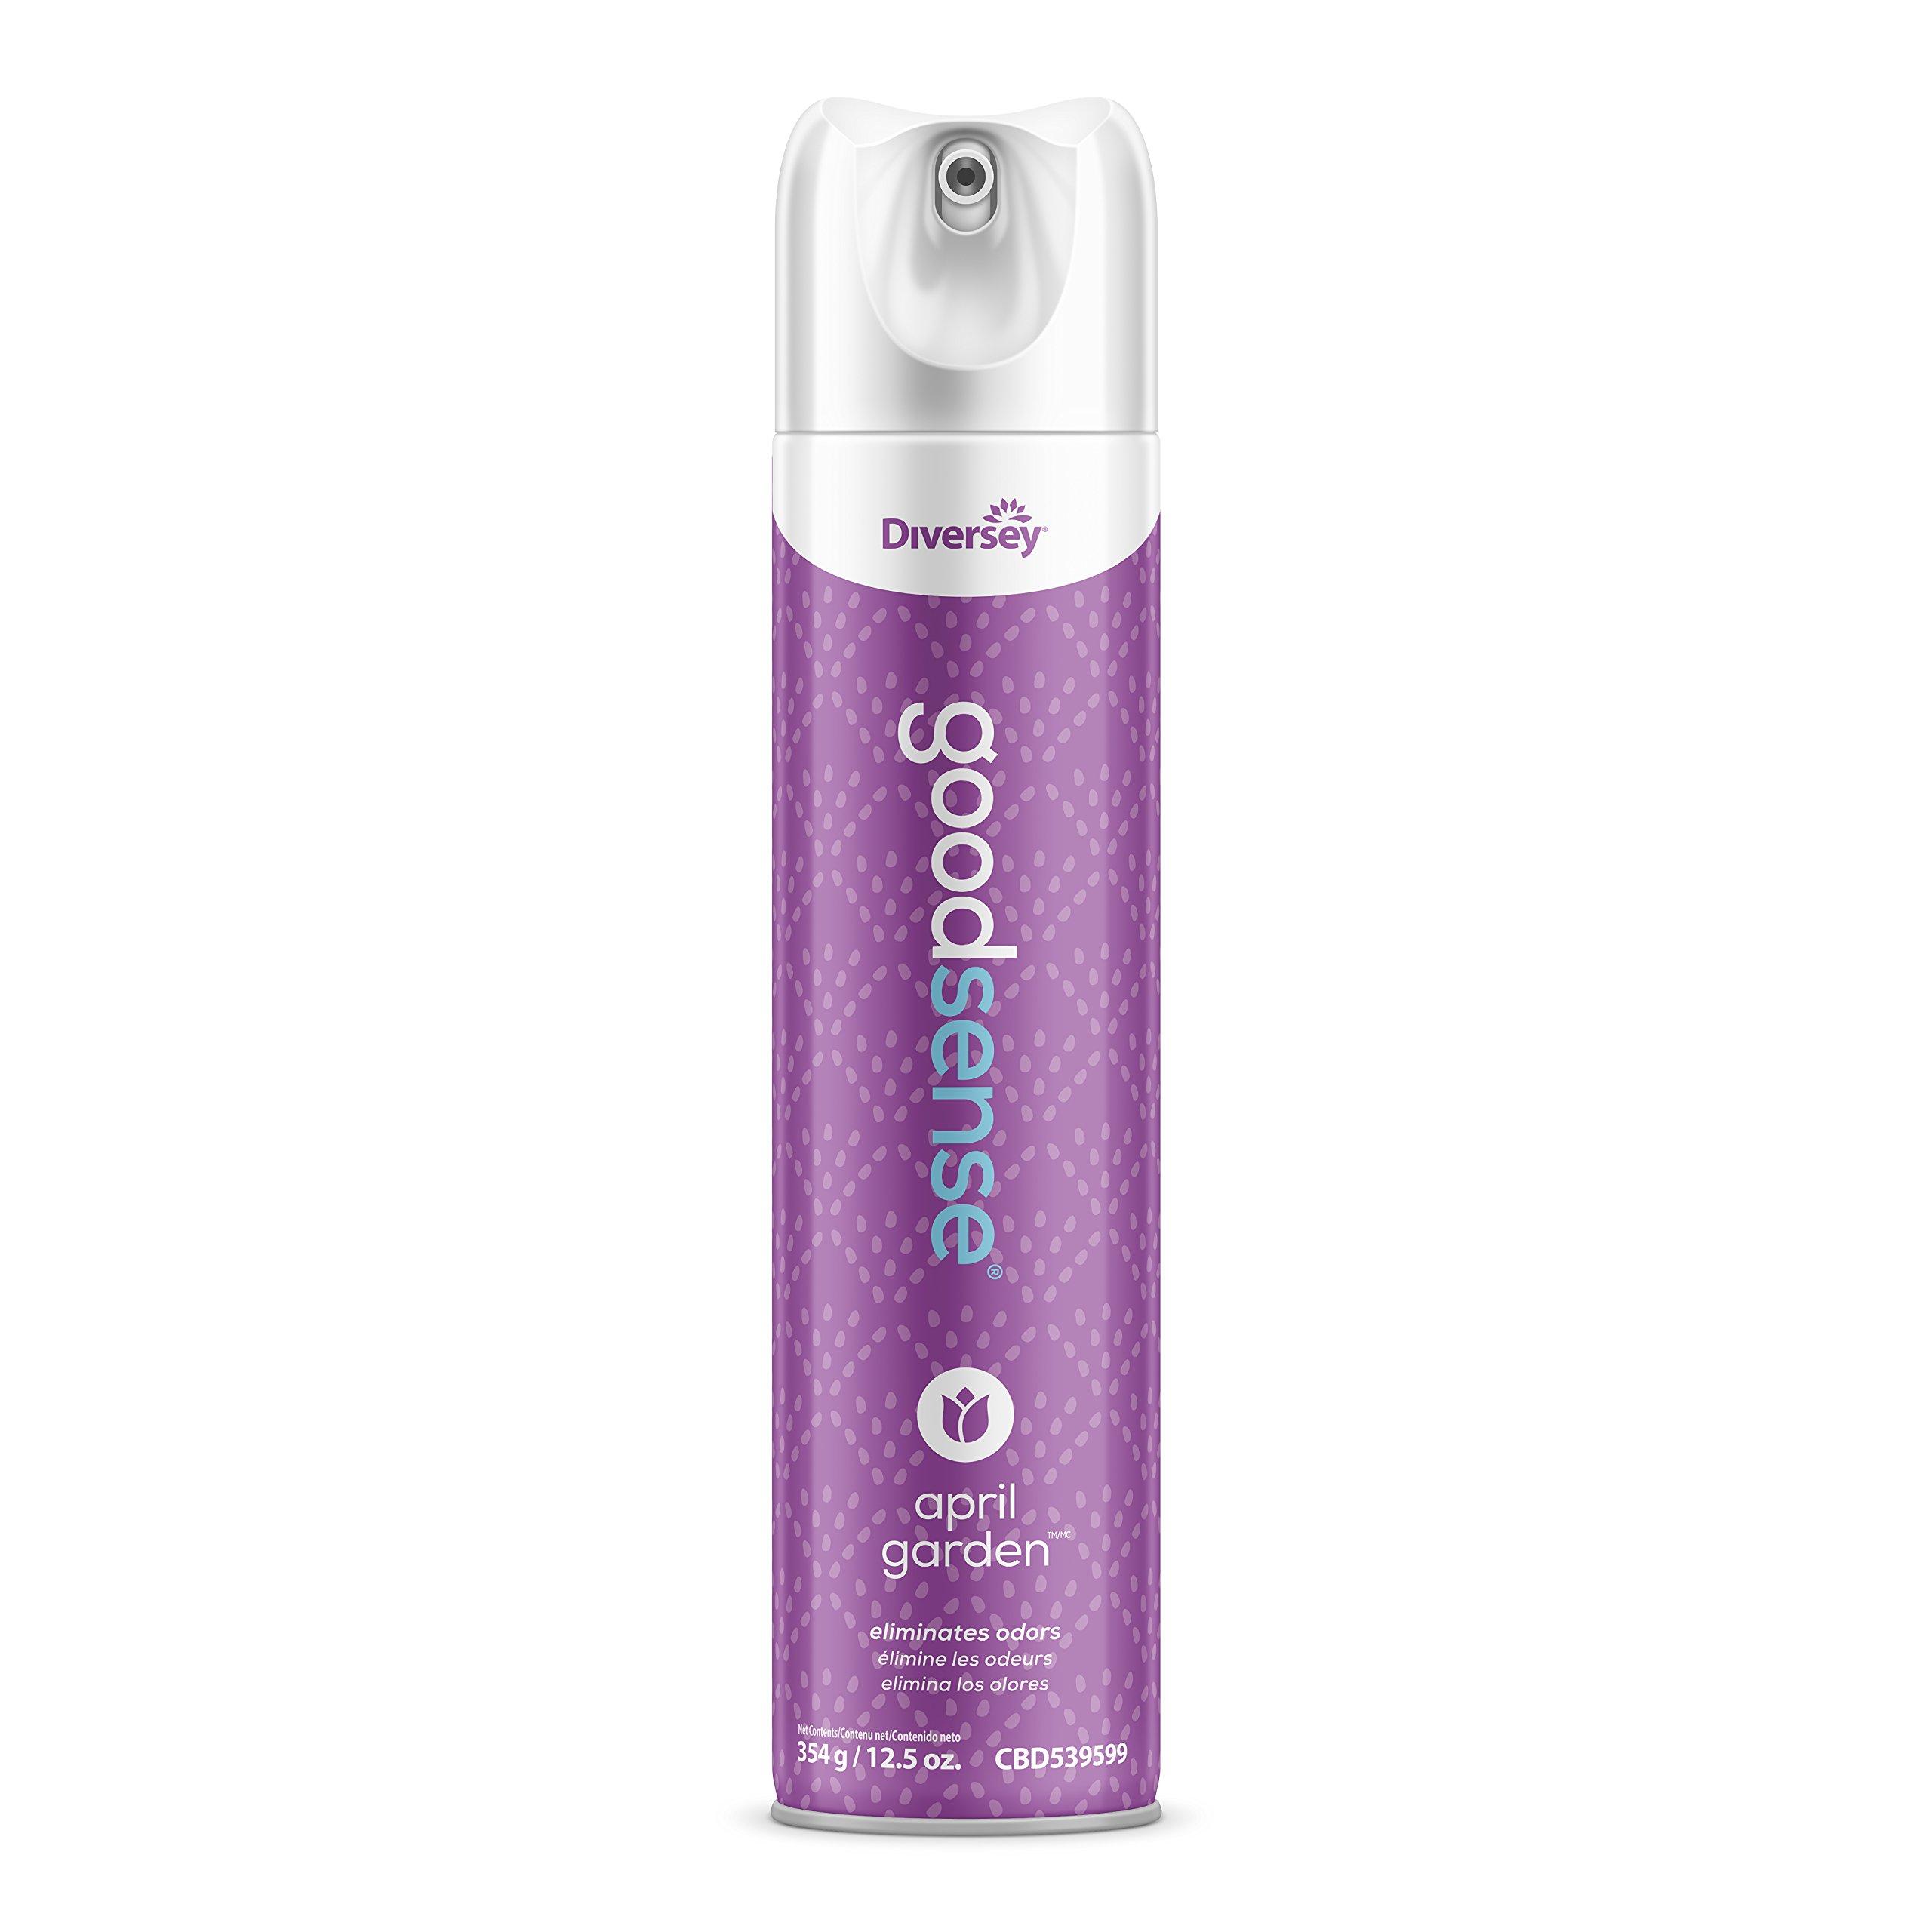 Diversey Good Sense Air Freshener - Water Based Odor Eliminating Spray - April Garden (6 Pack)